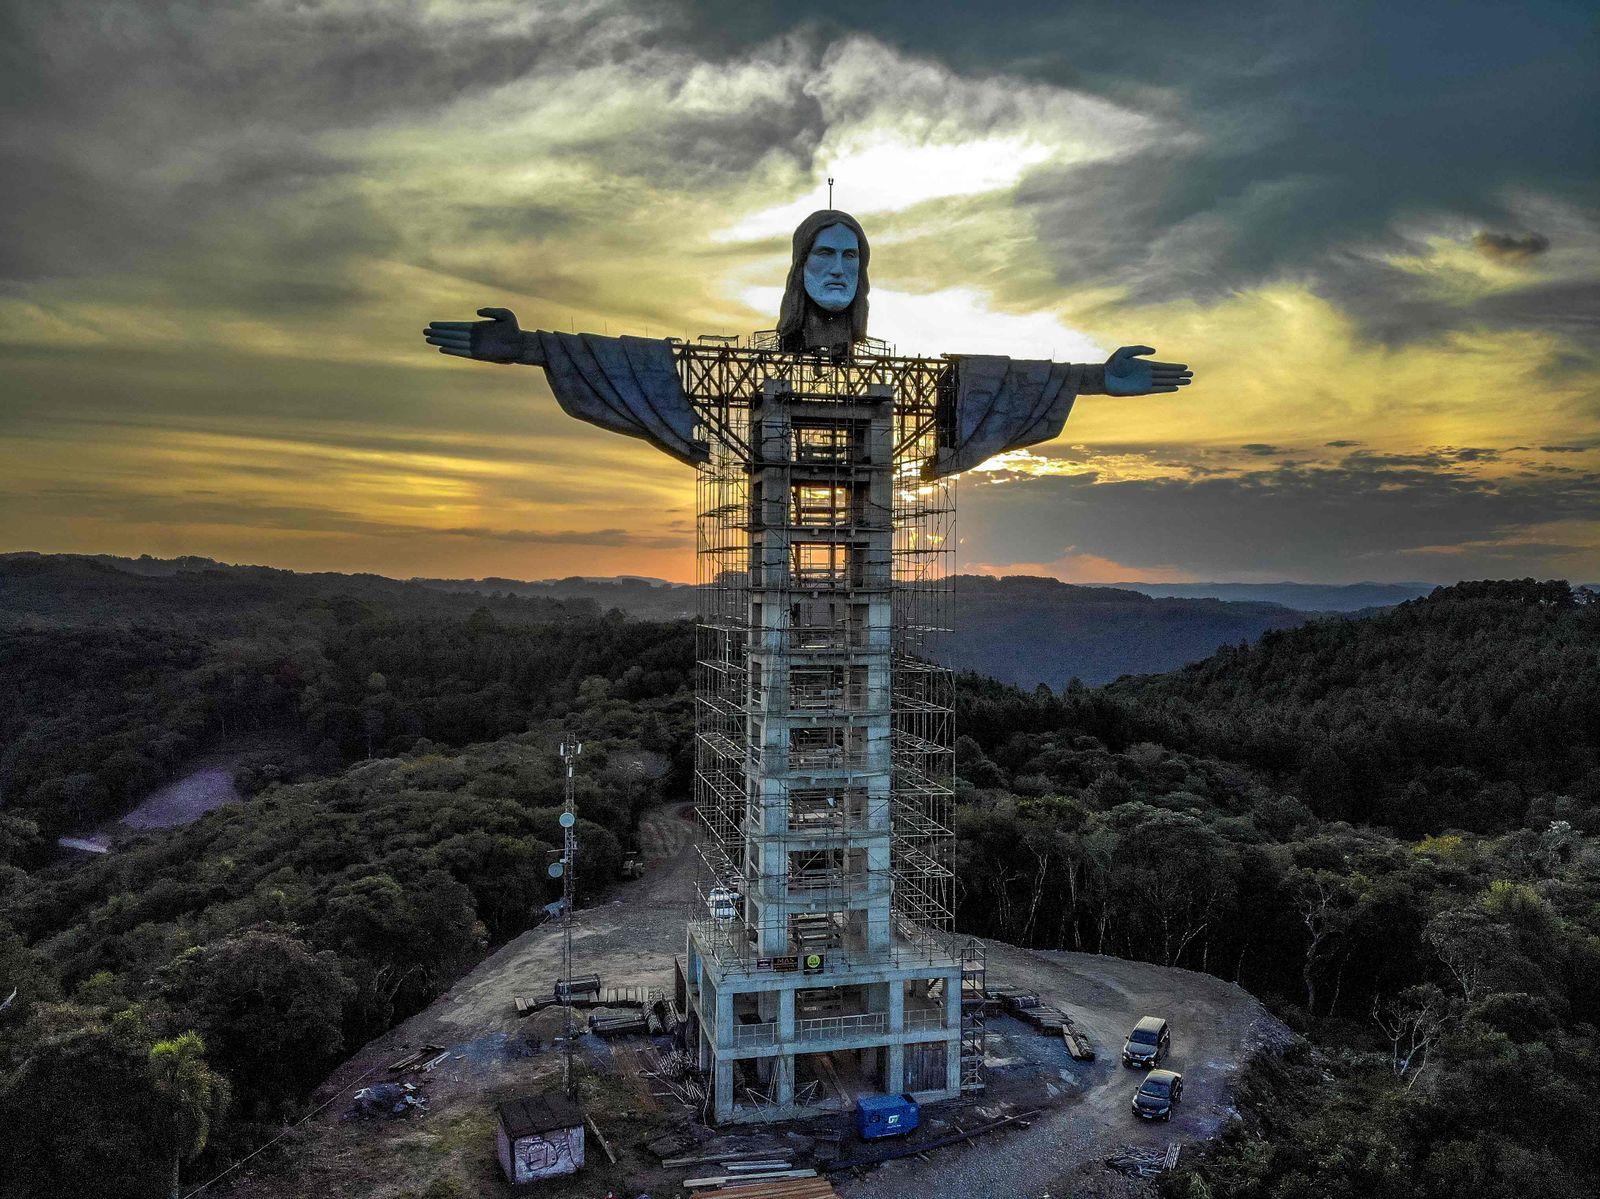 TOPSHOT-BRAZIL-RELIGION-CULTURE-CHRIST-STATUE